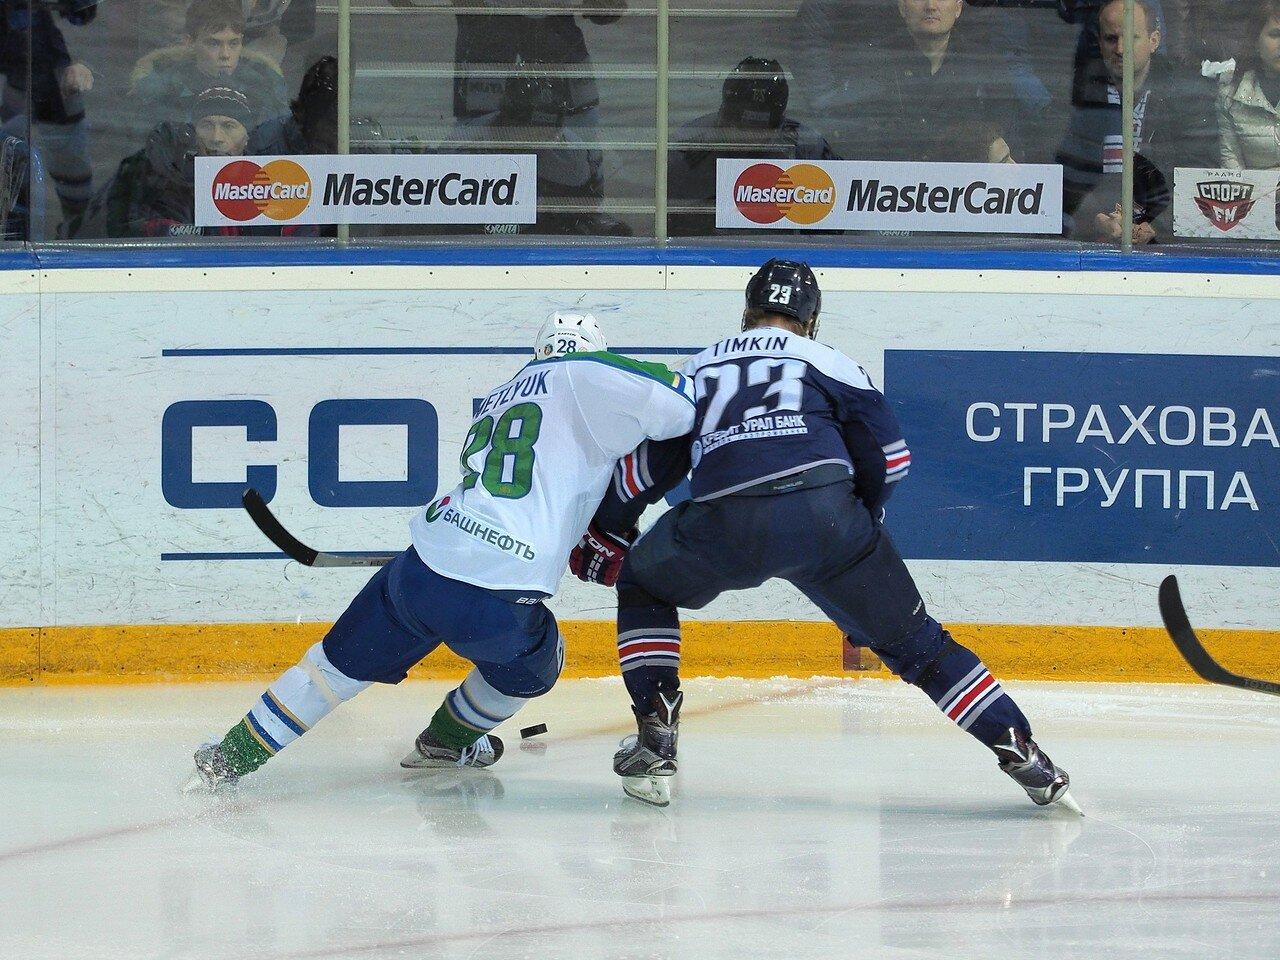 39Плей-офф 2016 Восток Финал Металлург - Салават Юлаев 31.03.2016